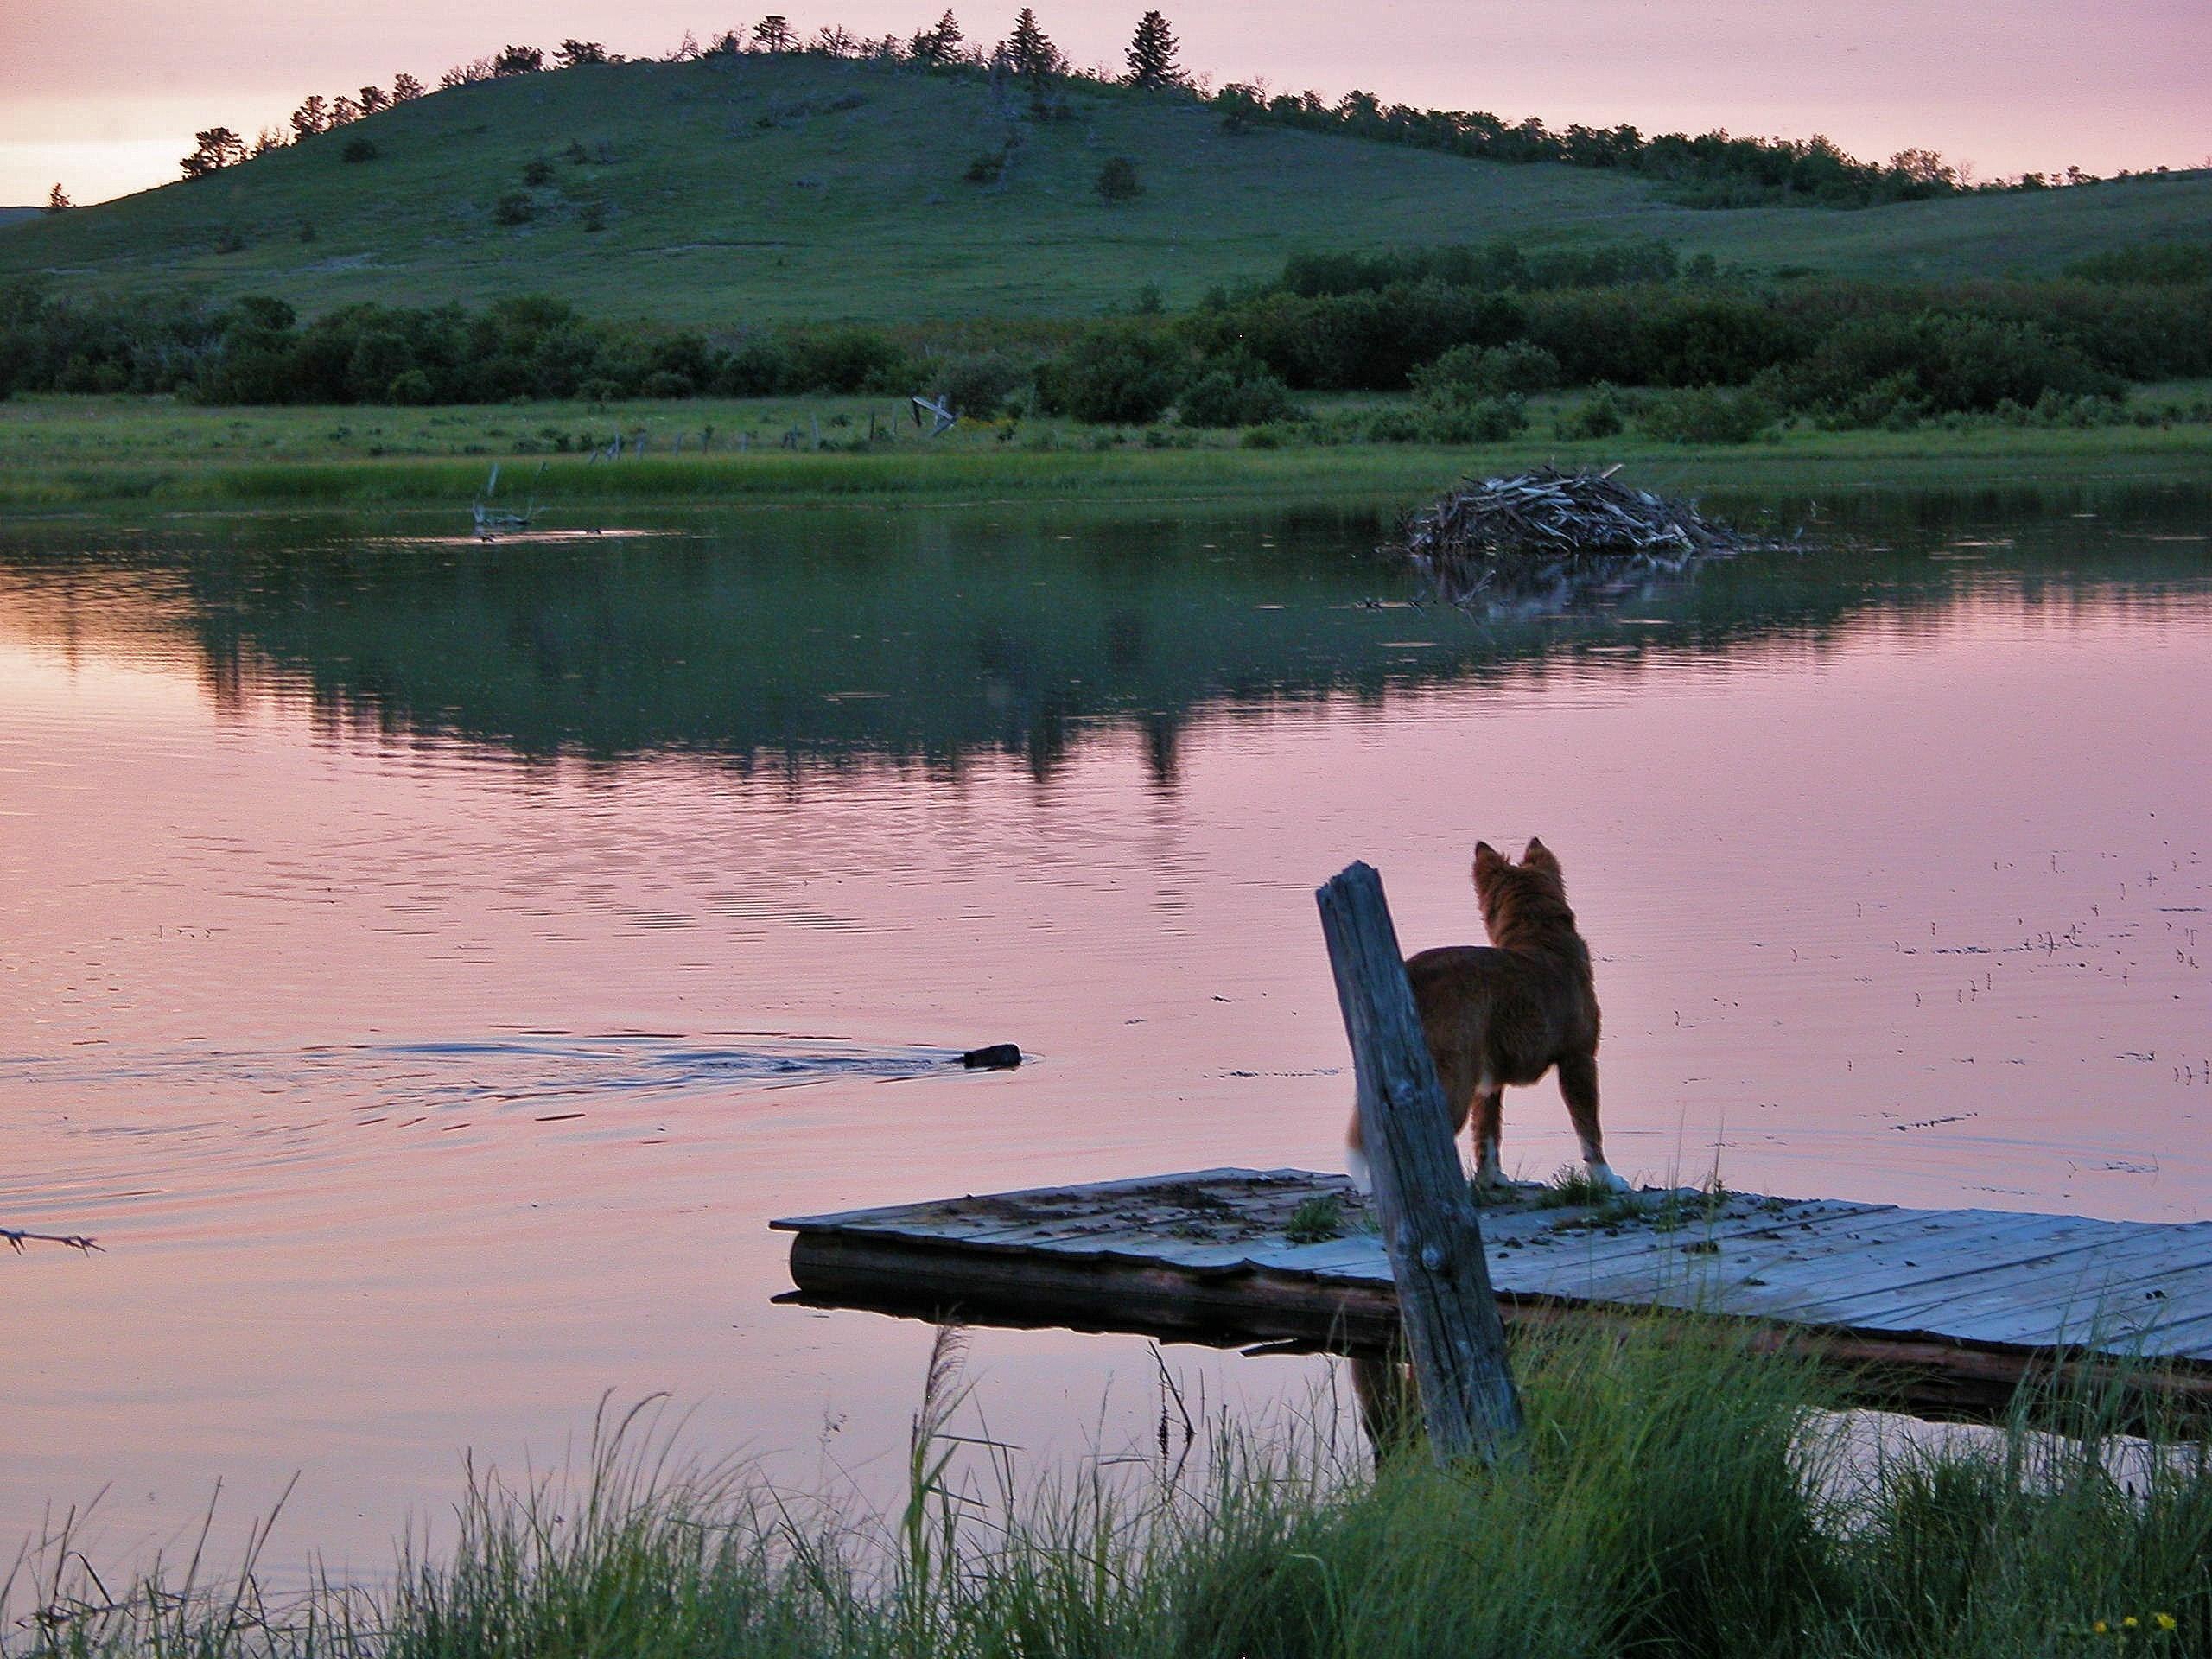 Aspenwood Resort, Browning MT